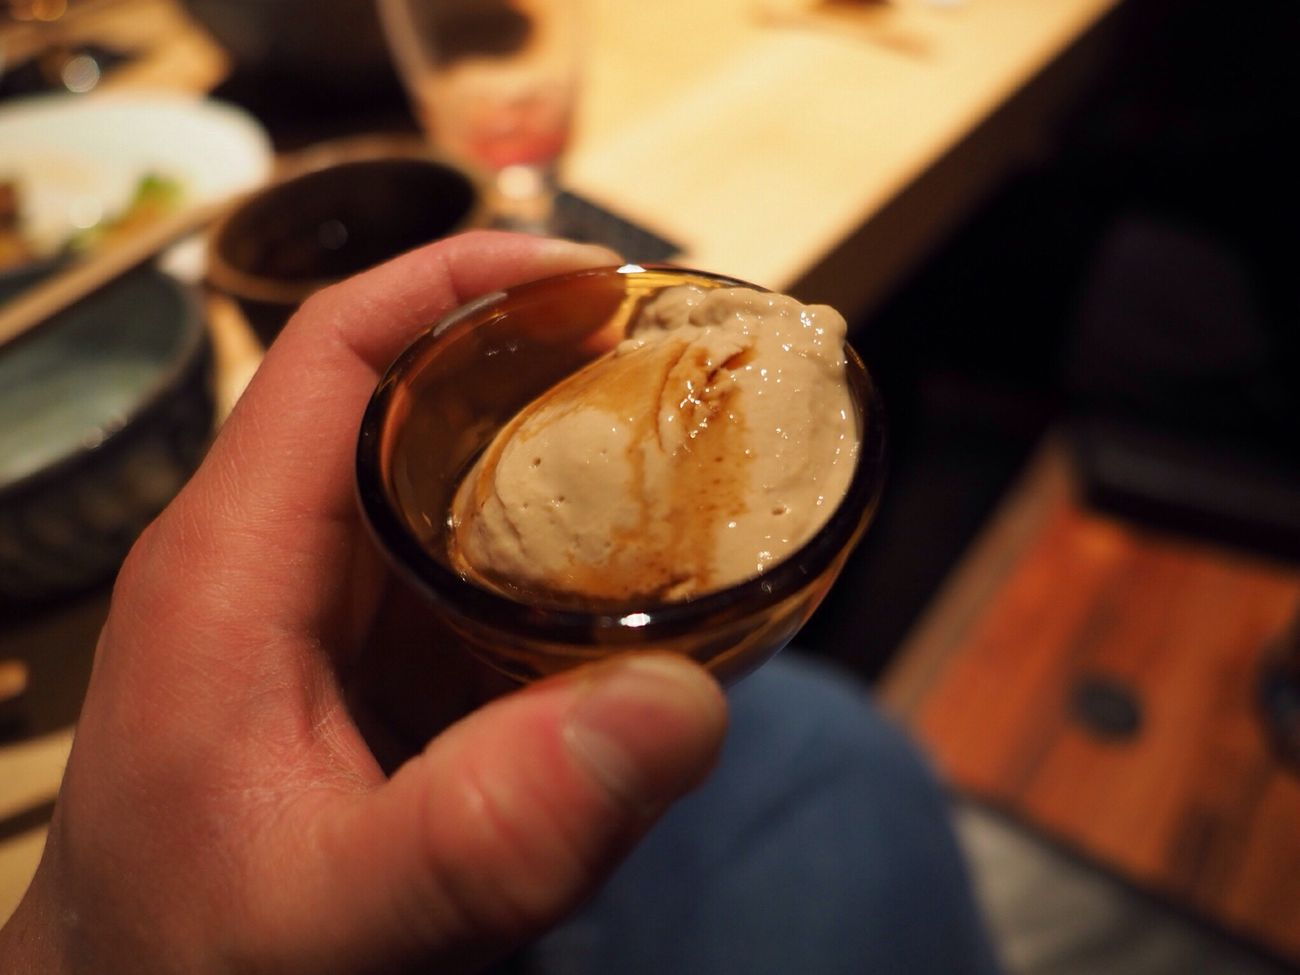 Kyoto Japan Nagaokakyo Enoki-ya Dinner Pudding Delicious Olympus PEN-F 京都 日本 長岡京 えのきや 食事会 プリン コーヒー? 美味 (null)デザート